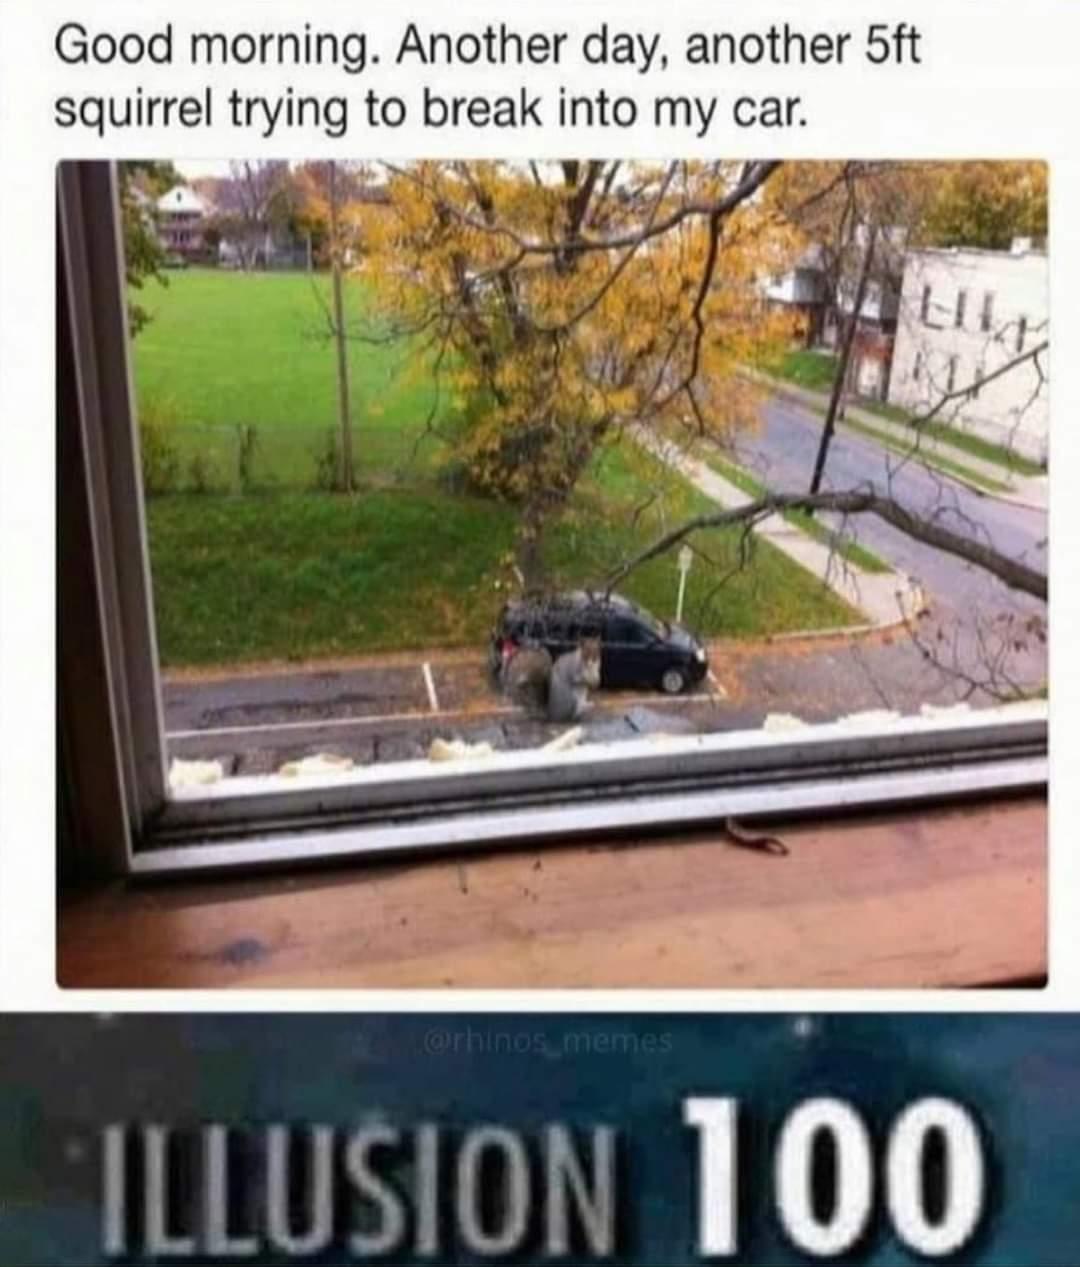 Memes Giant squirrel